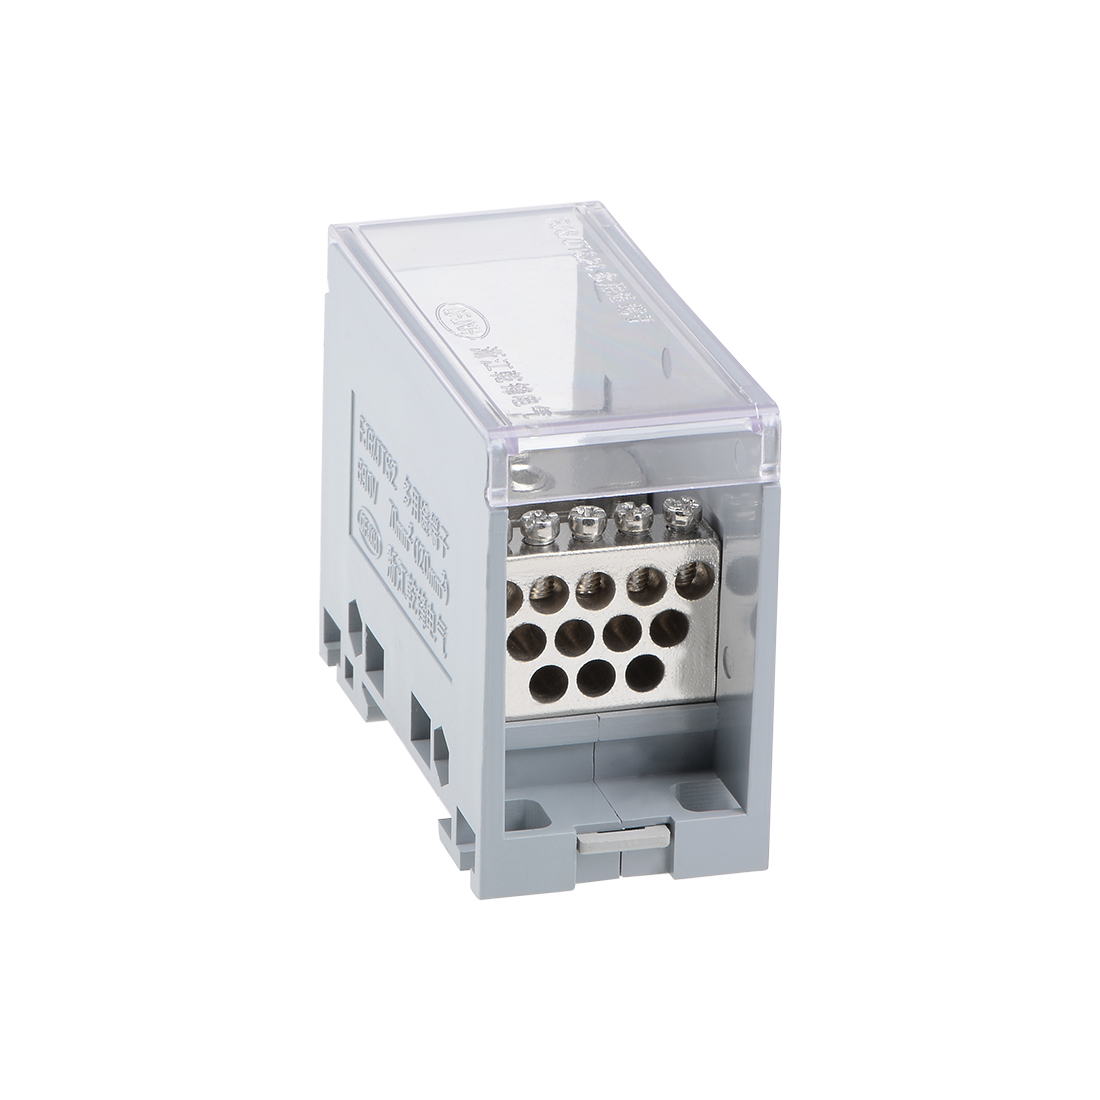 1 Input 12 Output 35mm DIN Rail Terminal Blocks 690V Connectors Distribution Block